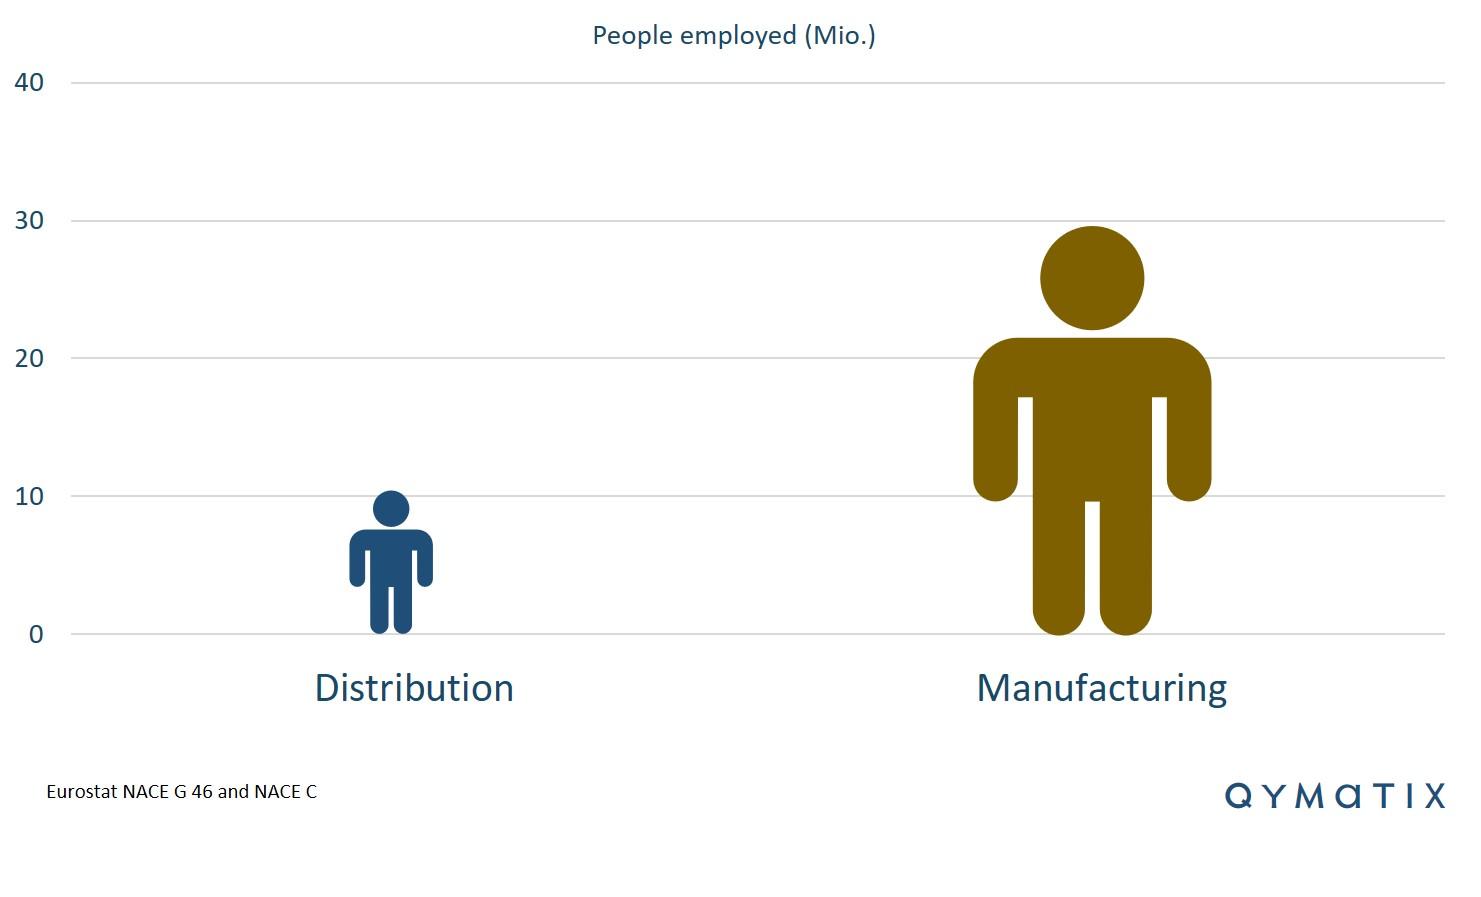 people-employed-distribution-manufacturing